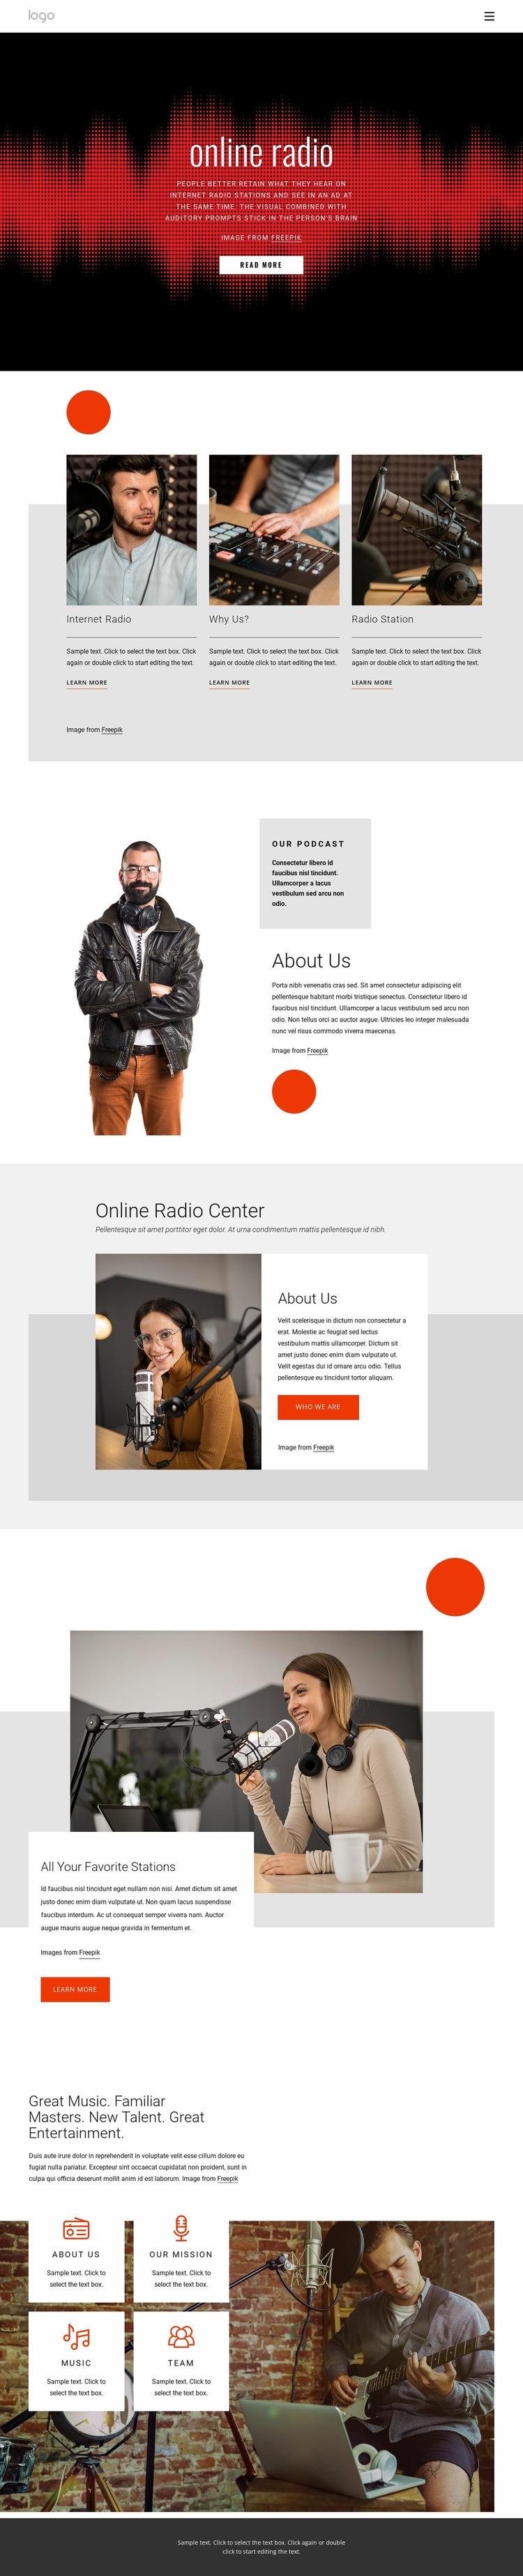 Online radio shows Html Code Example